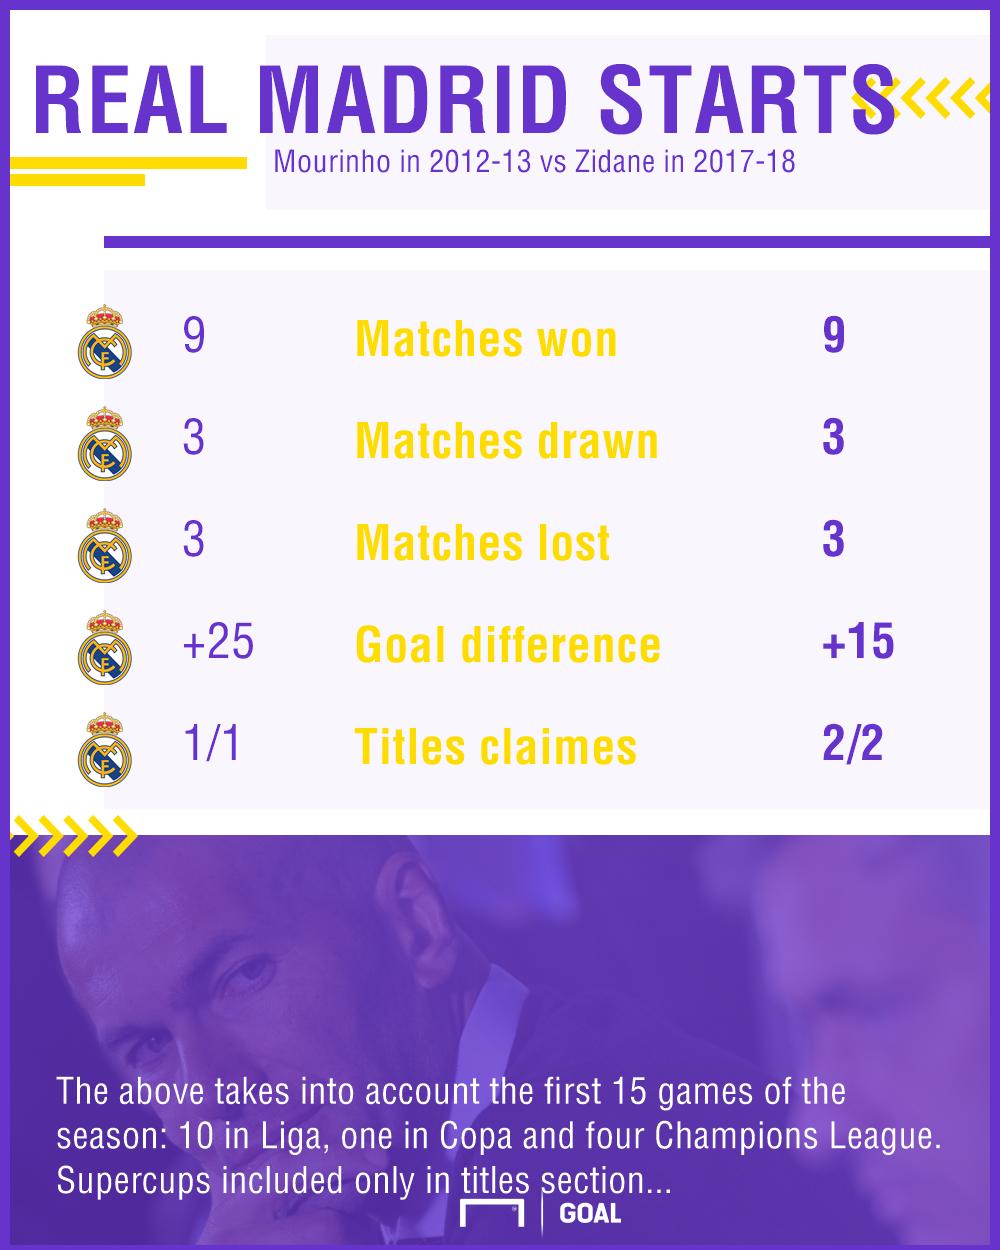 Real Madrid starts graphic